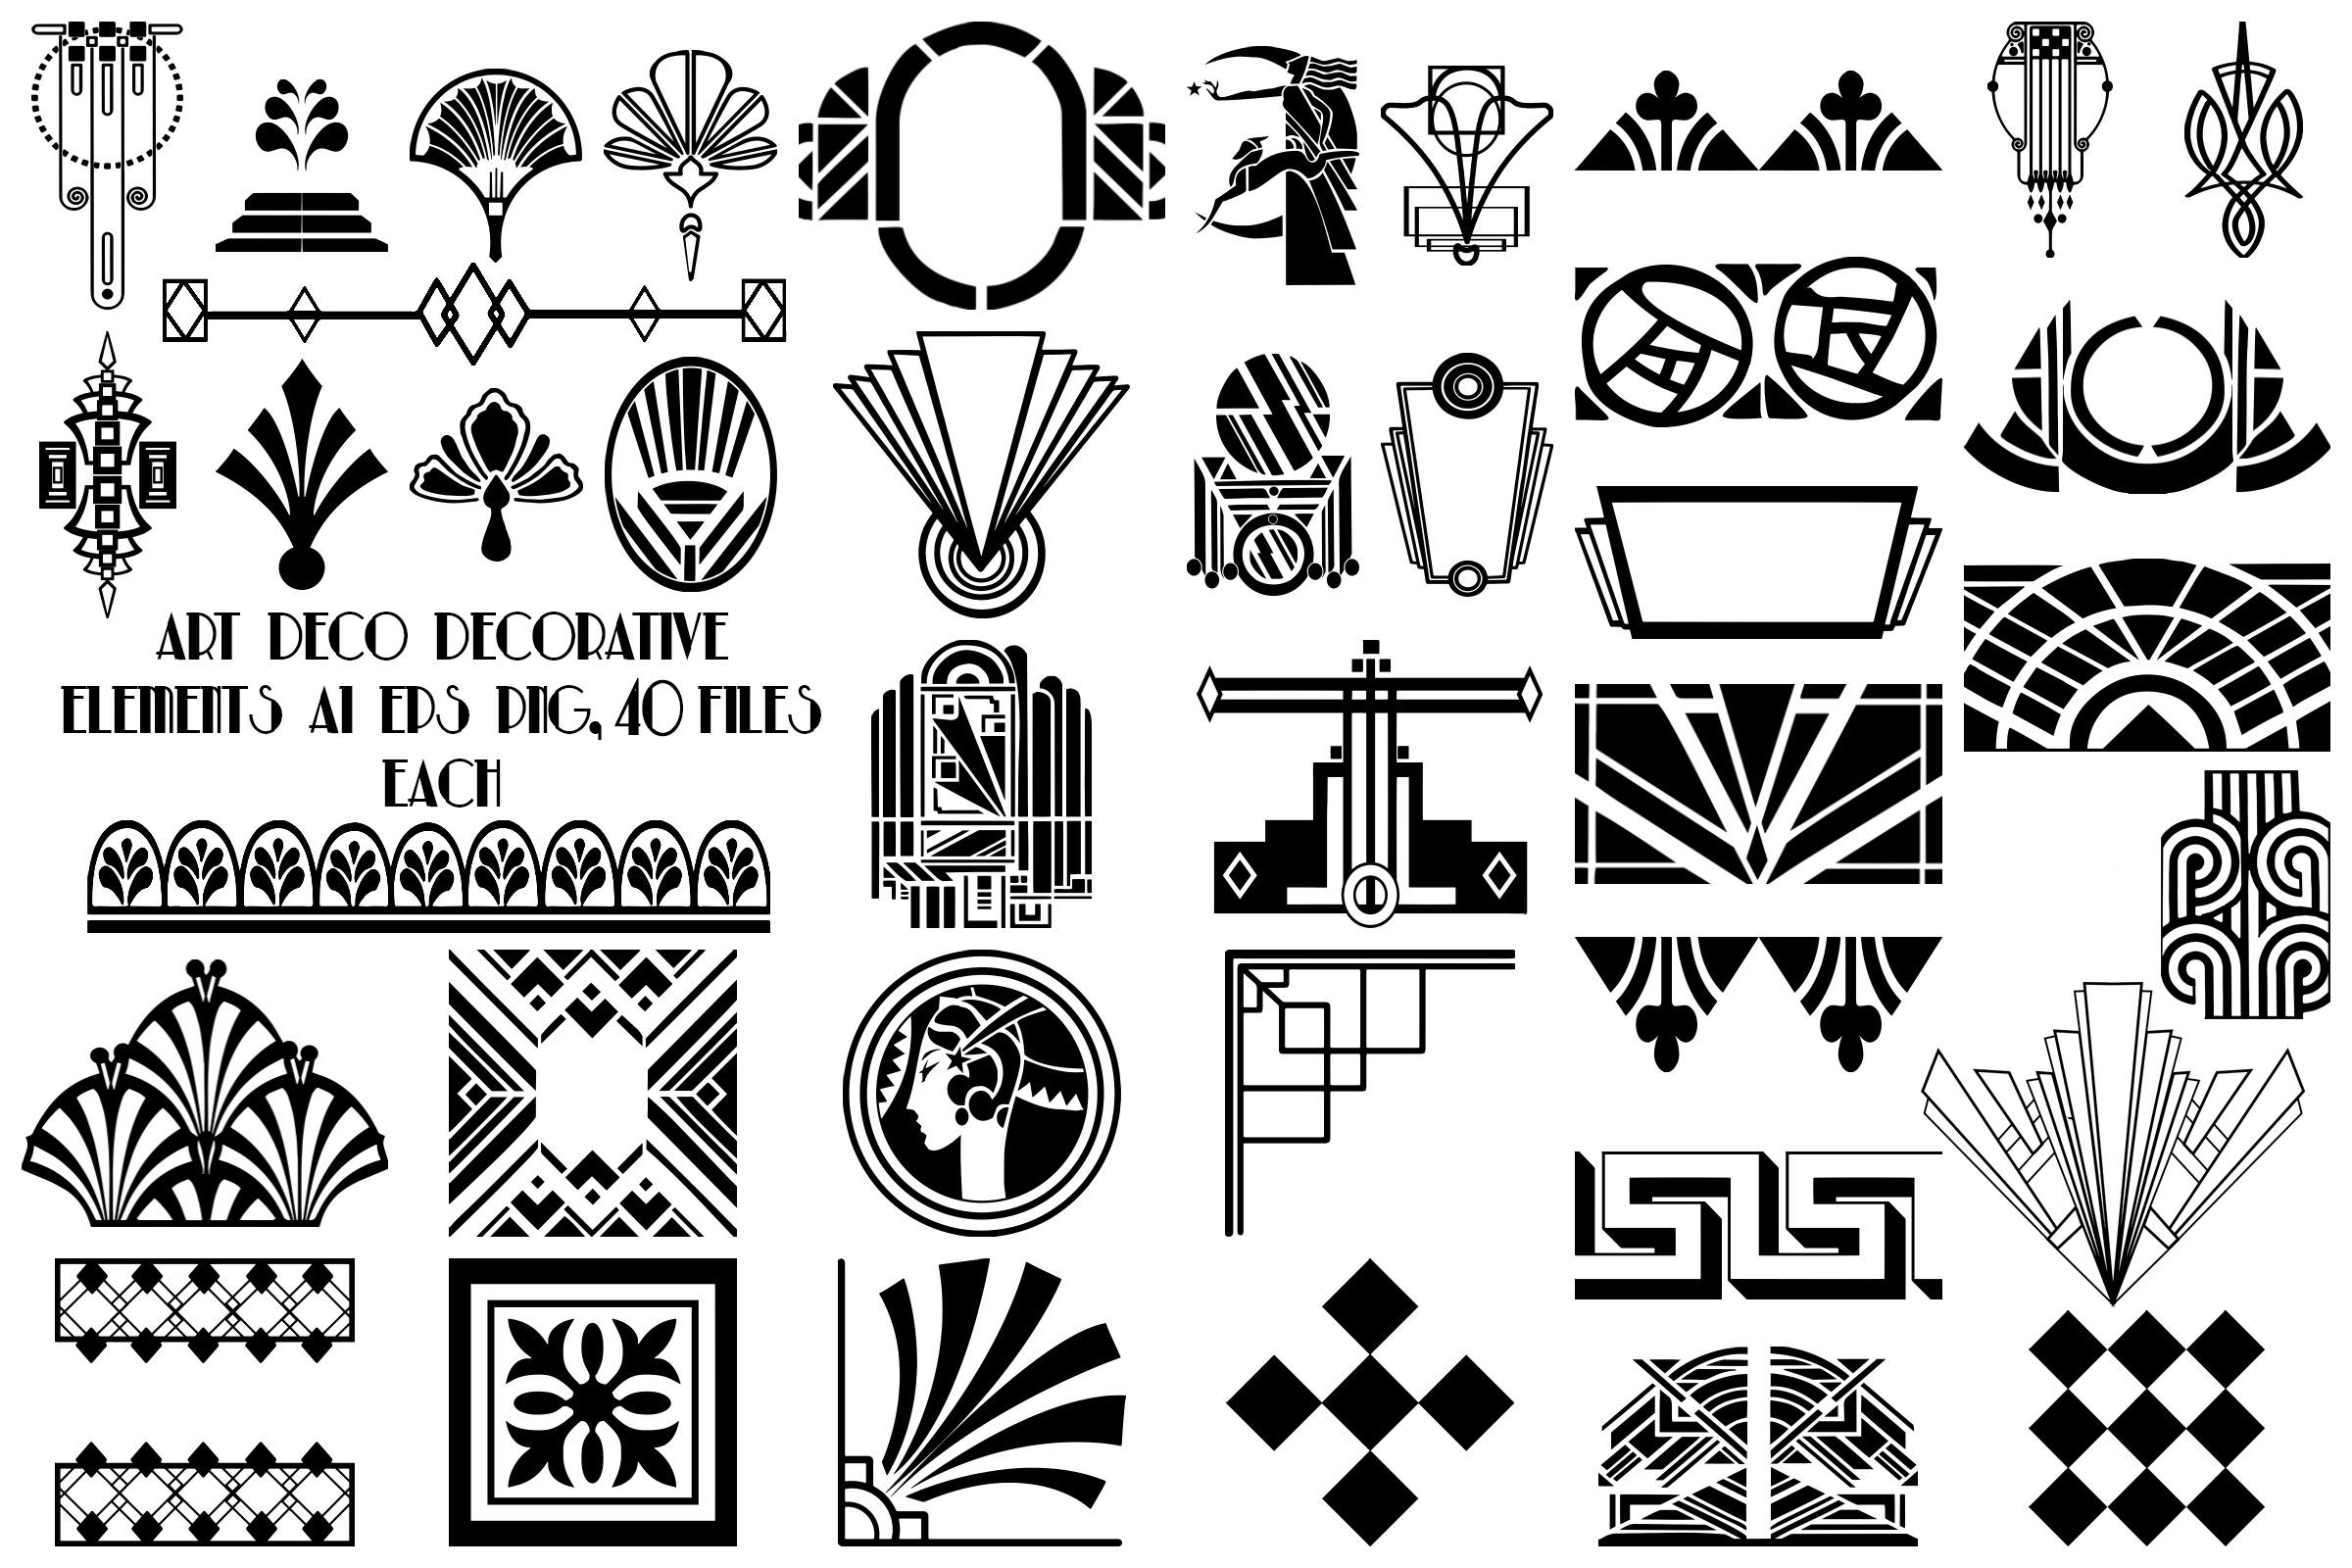 Art Deco Decorative Elements AI EPS PNG, Gatsby Style.